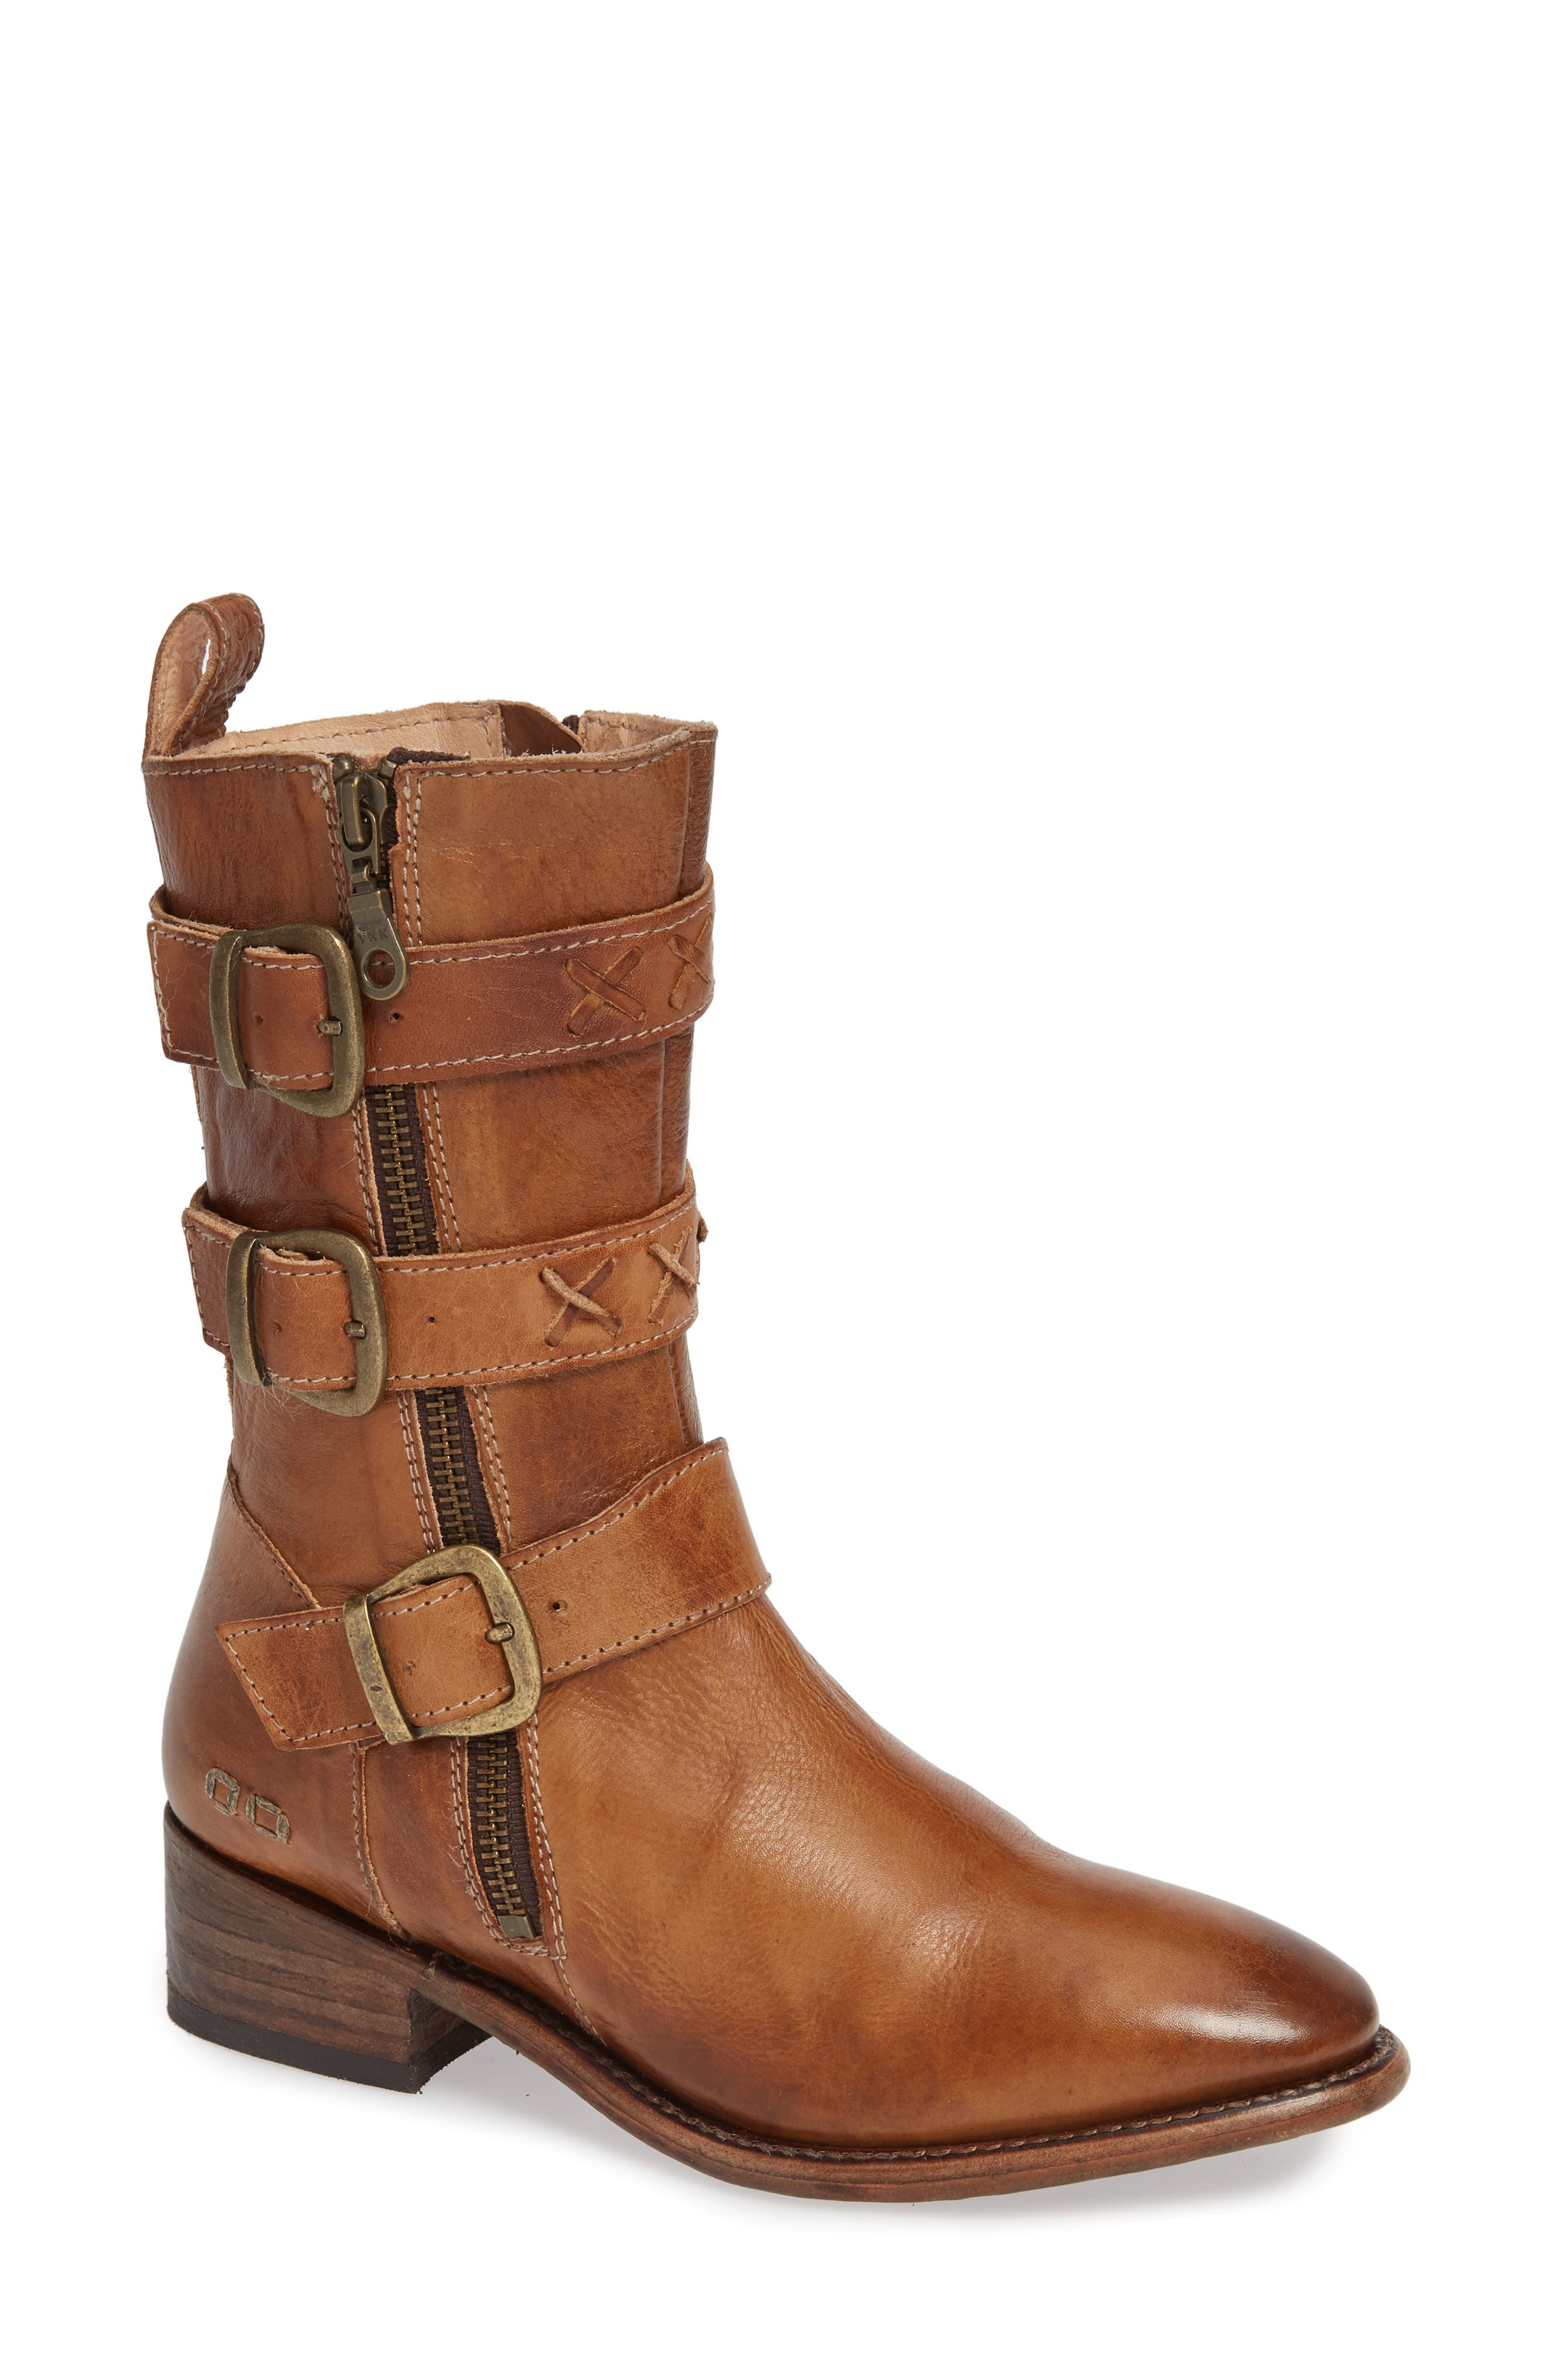 Bed Stu Blanchett Boot, Brown